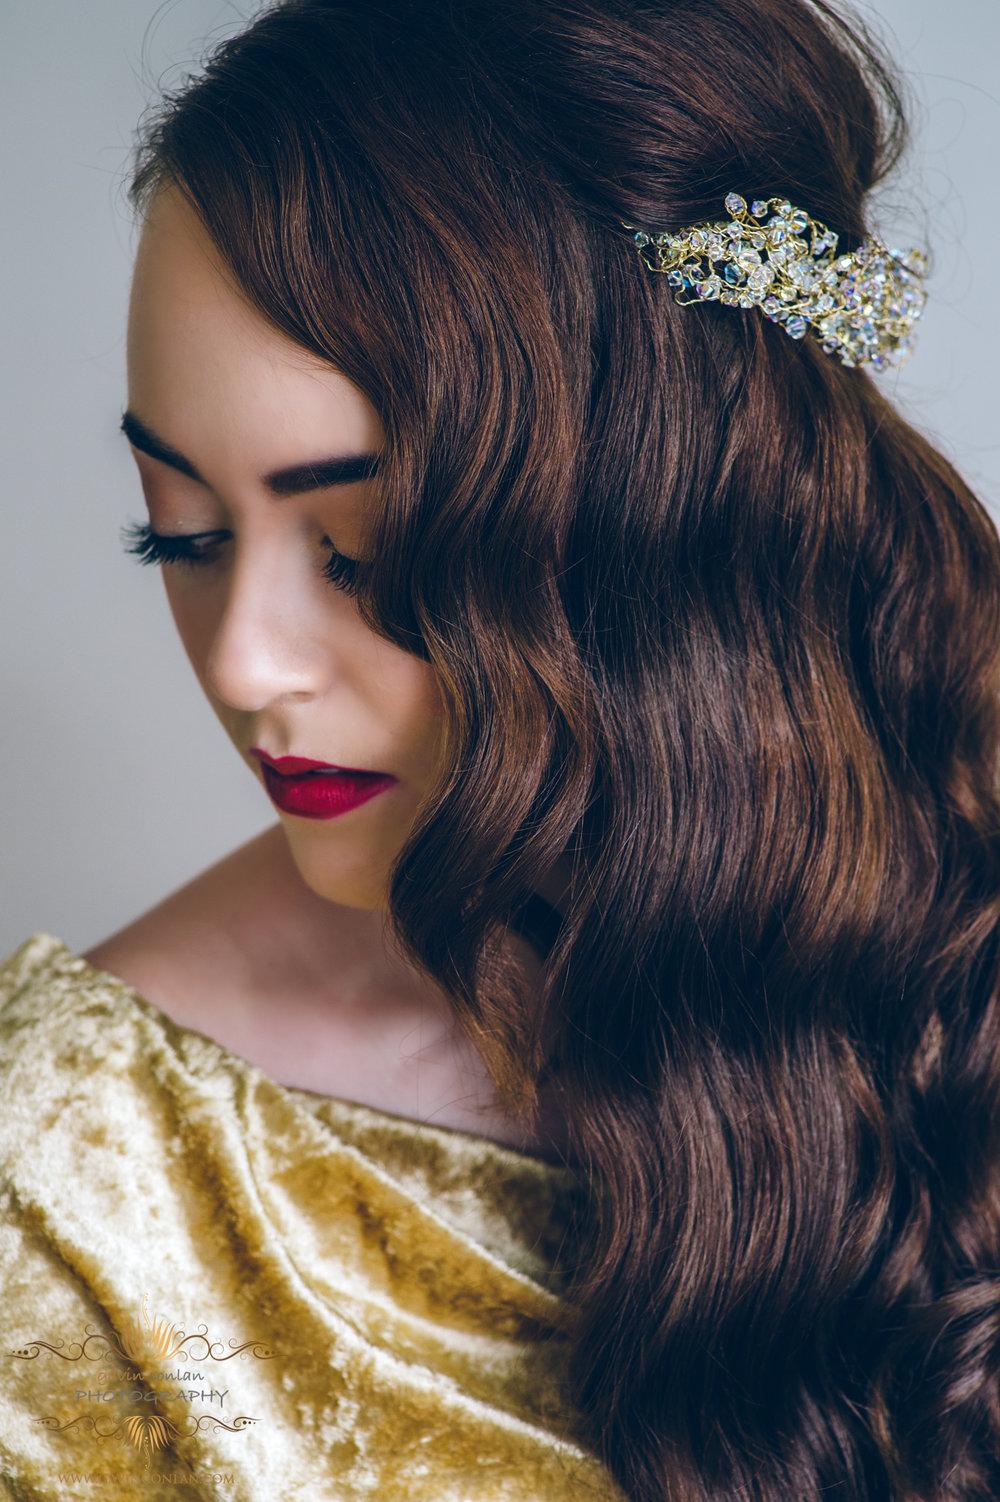 creative-bridal-hair-make-up-jewellery-photo-shoot-gavinconlanphotography-02